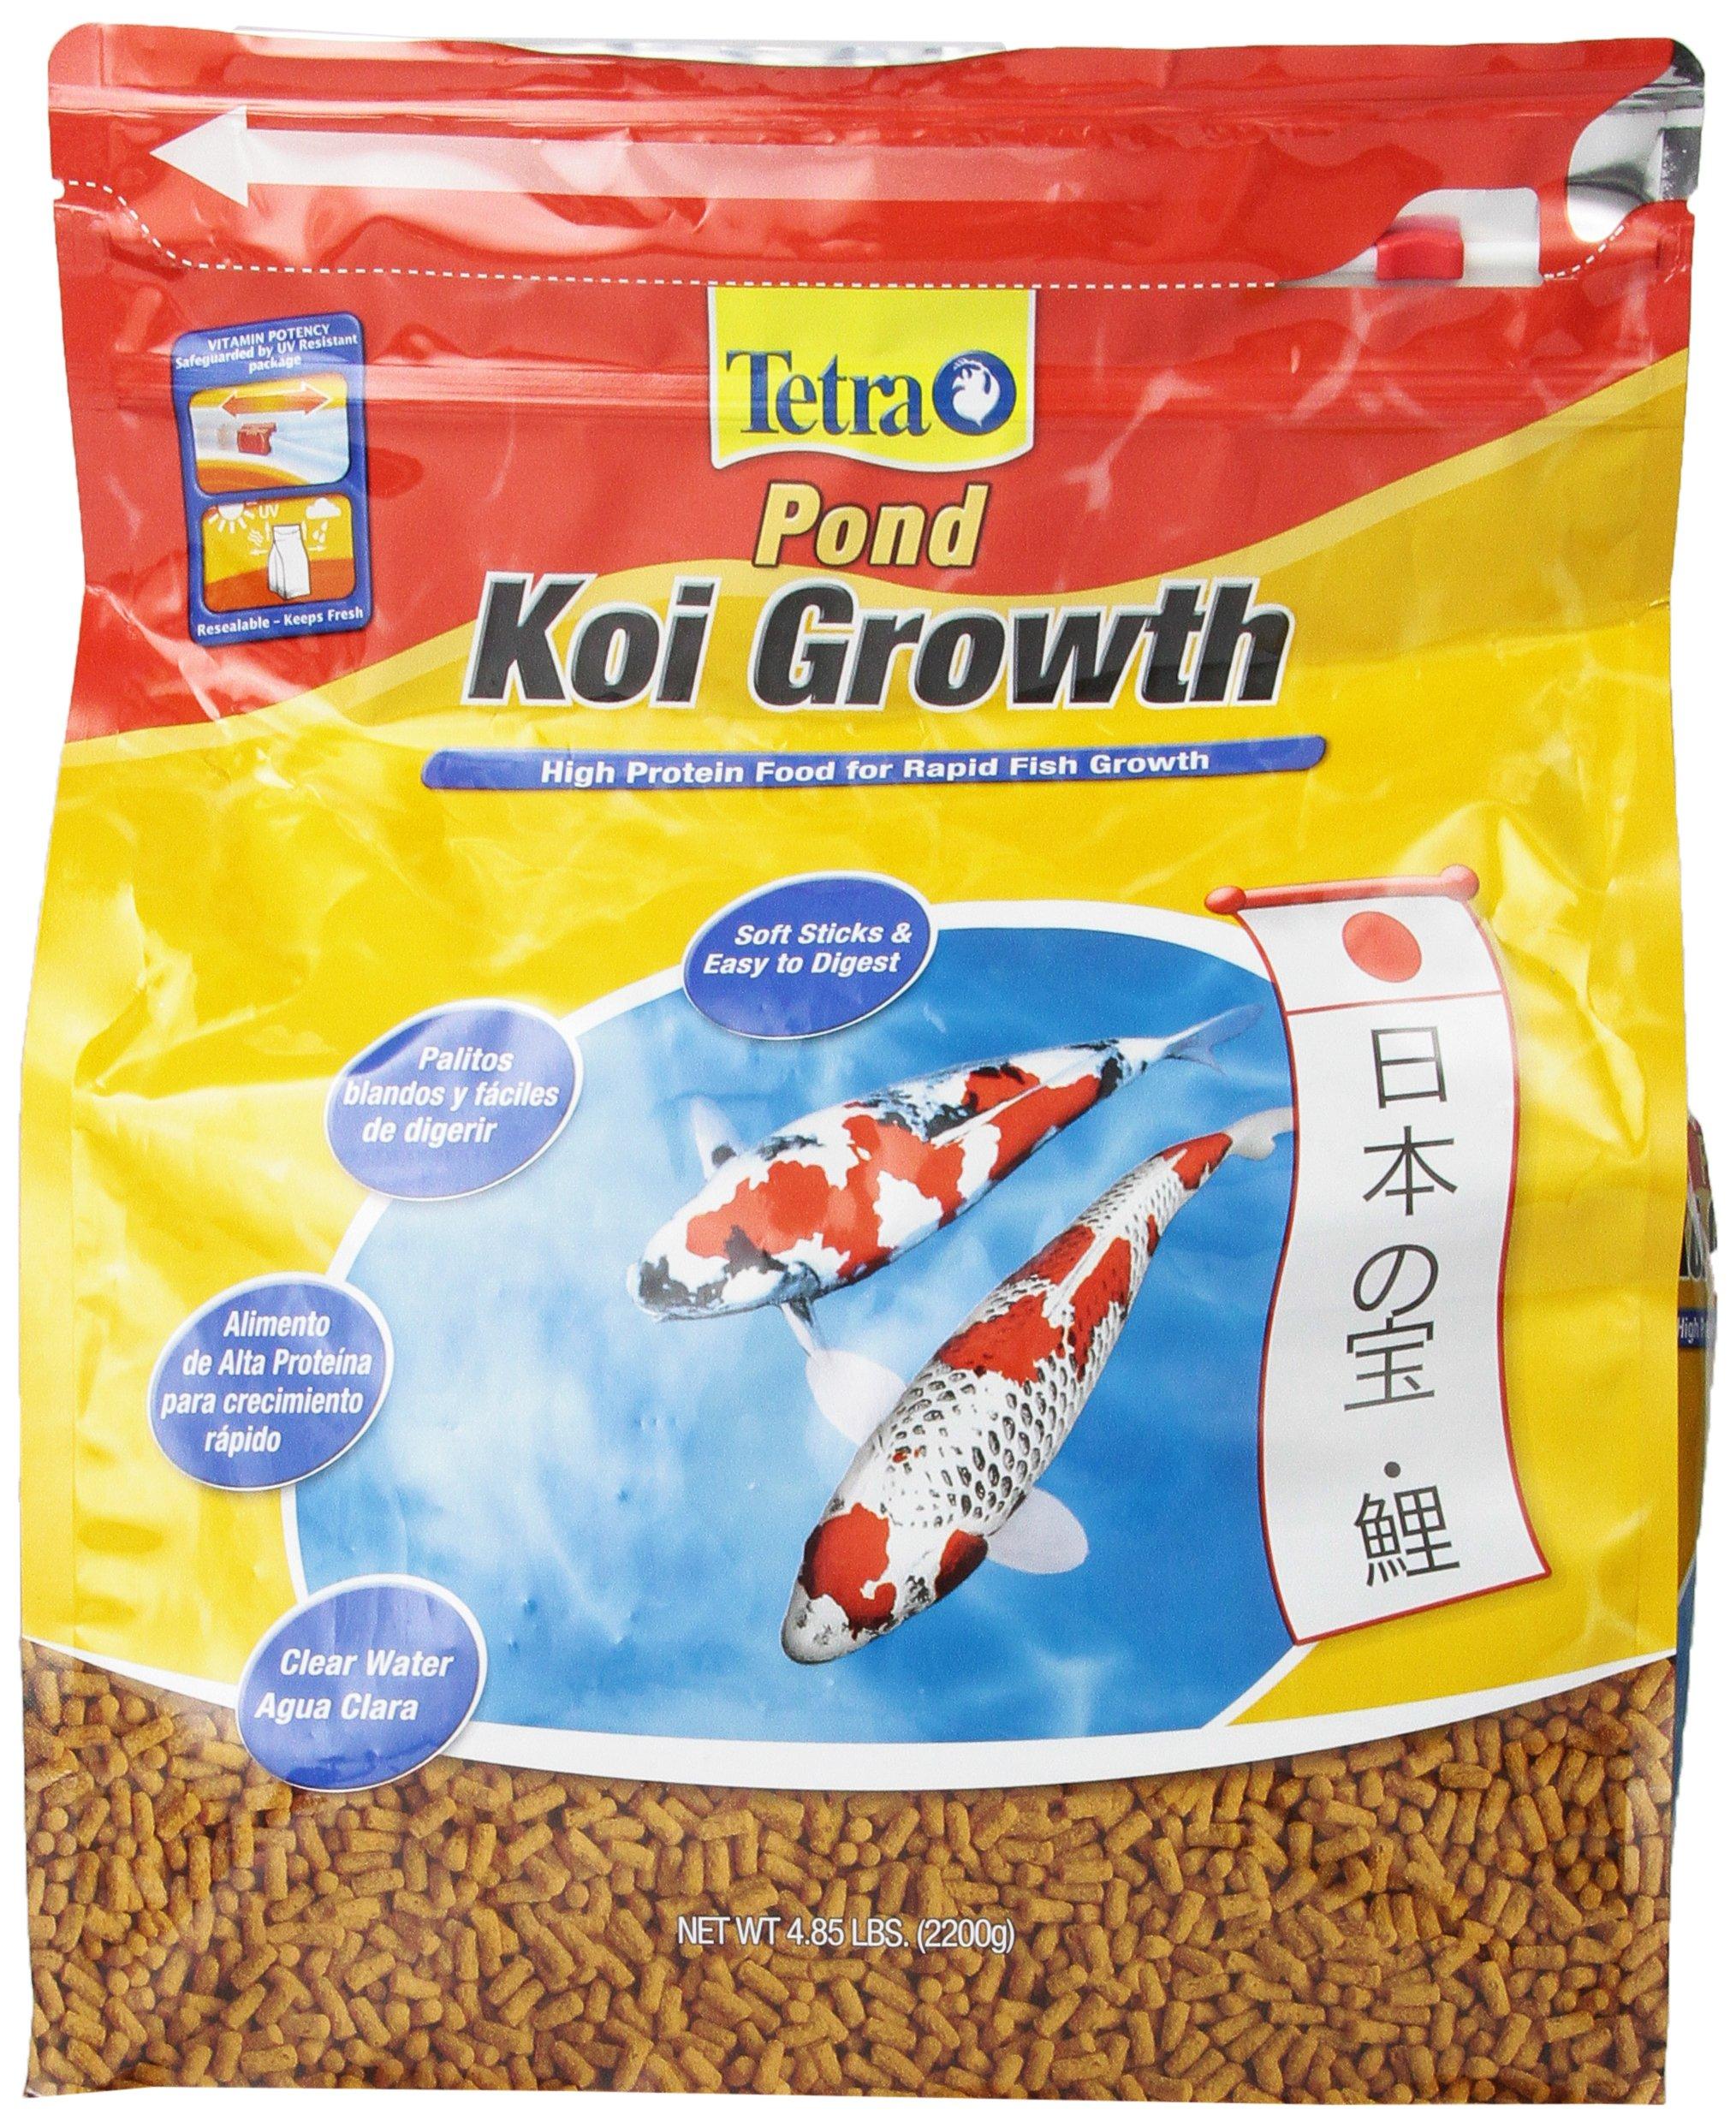 TetraPond Koi Growth Food, 4.85 lb. by Tetra